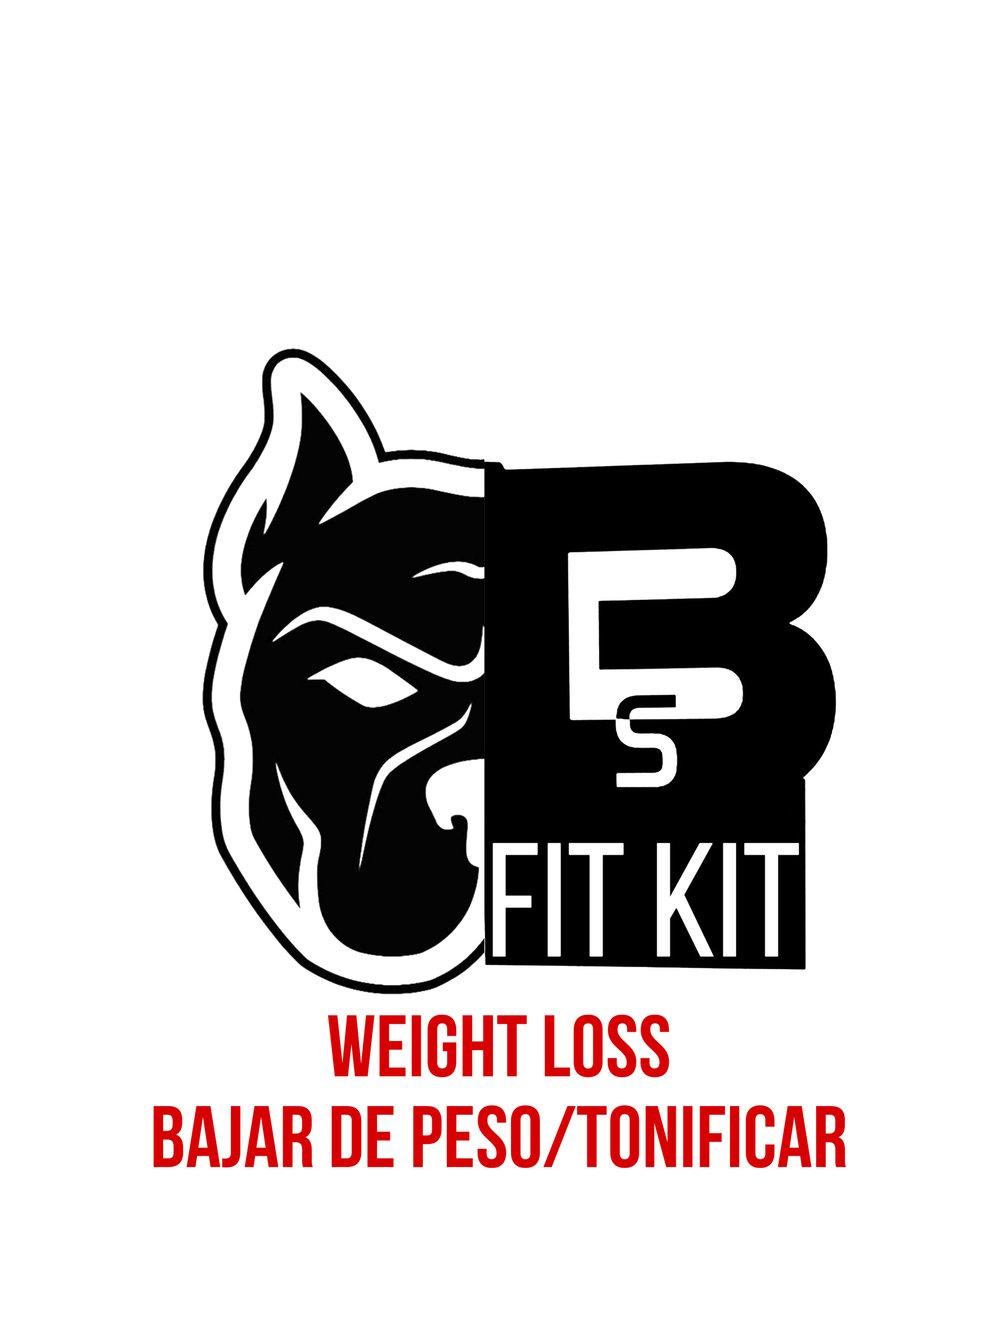 BS FIT (Weight Loss/Bajar Peso/Tonificar) KIT